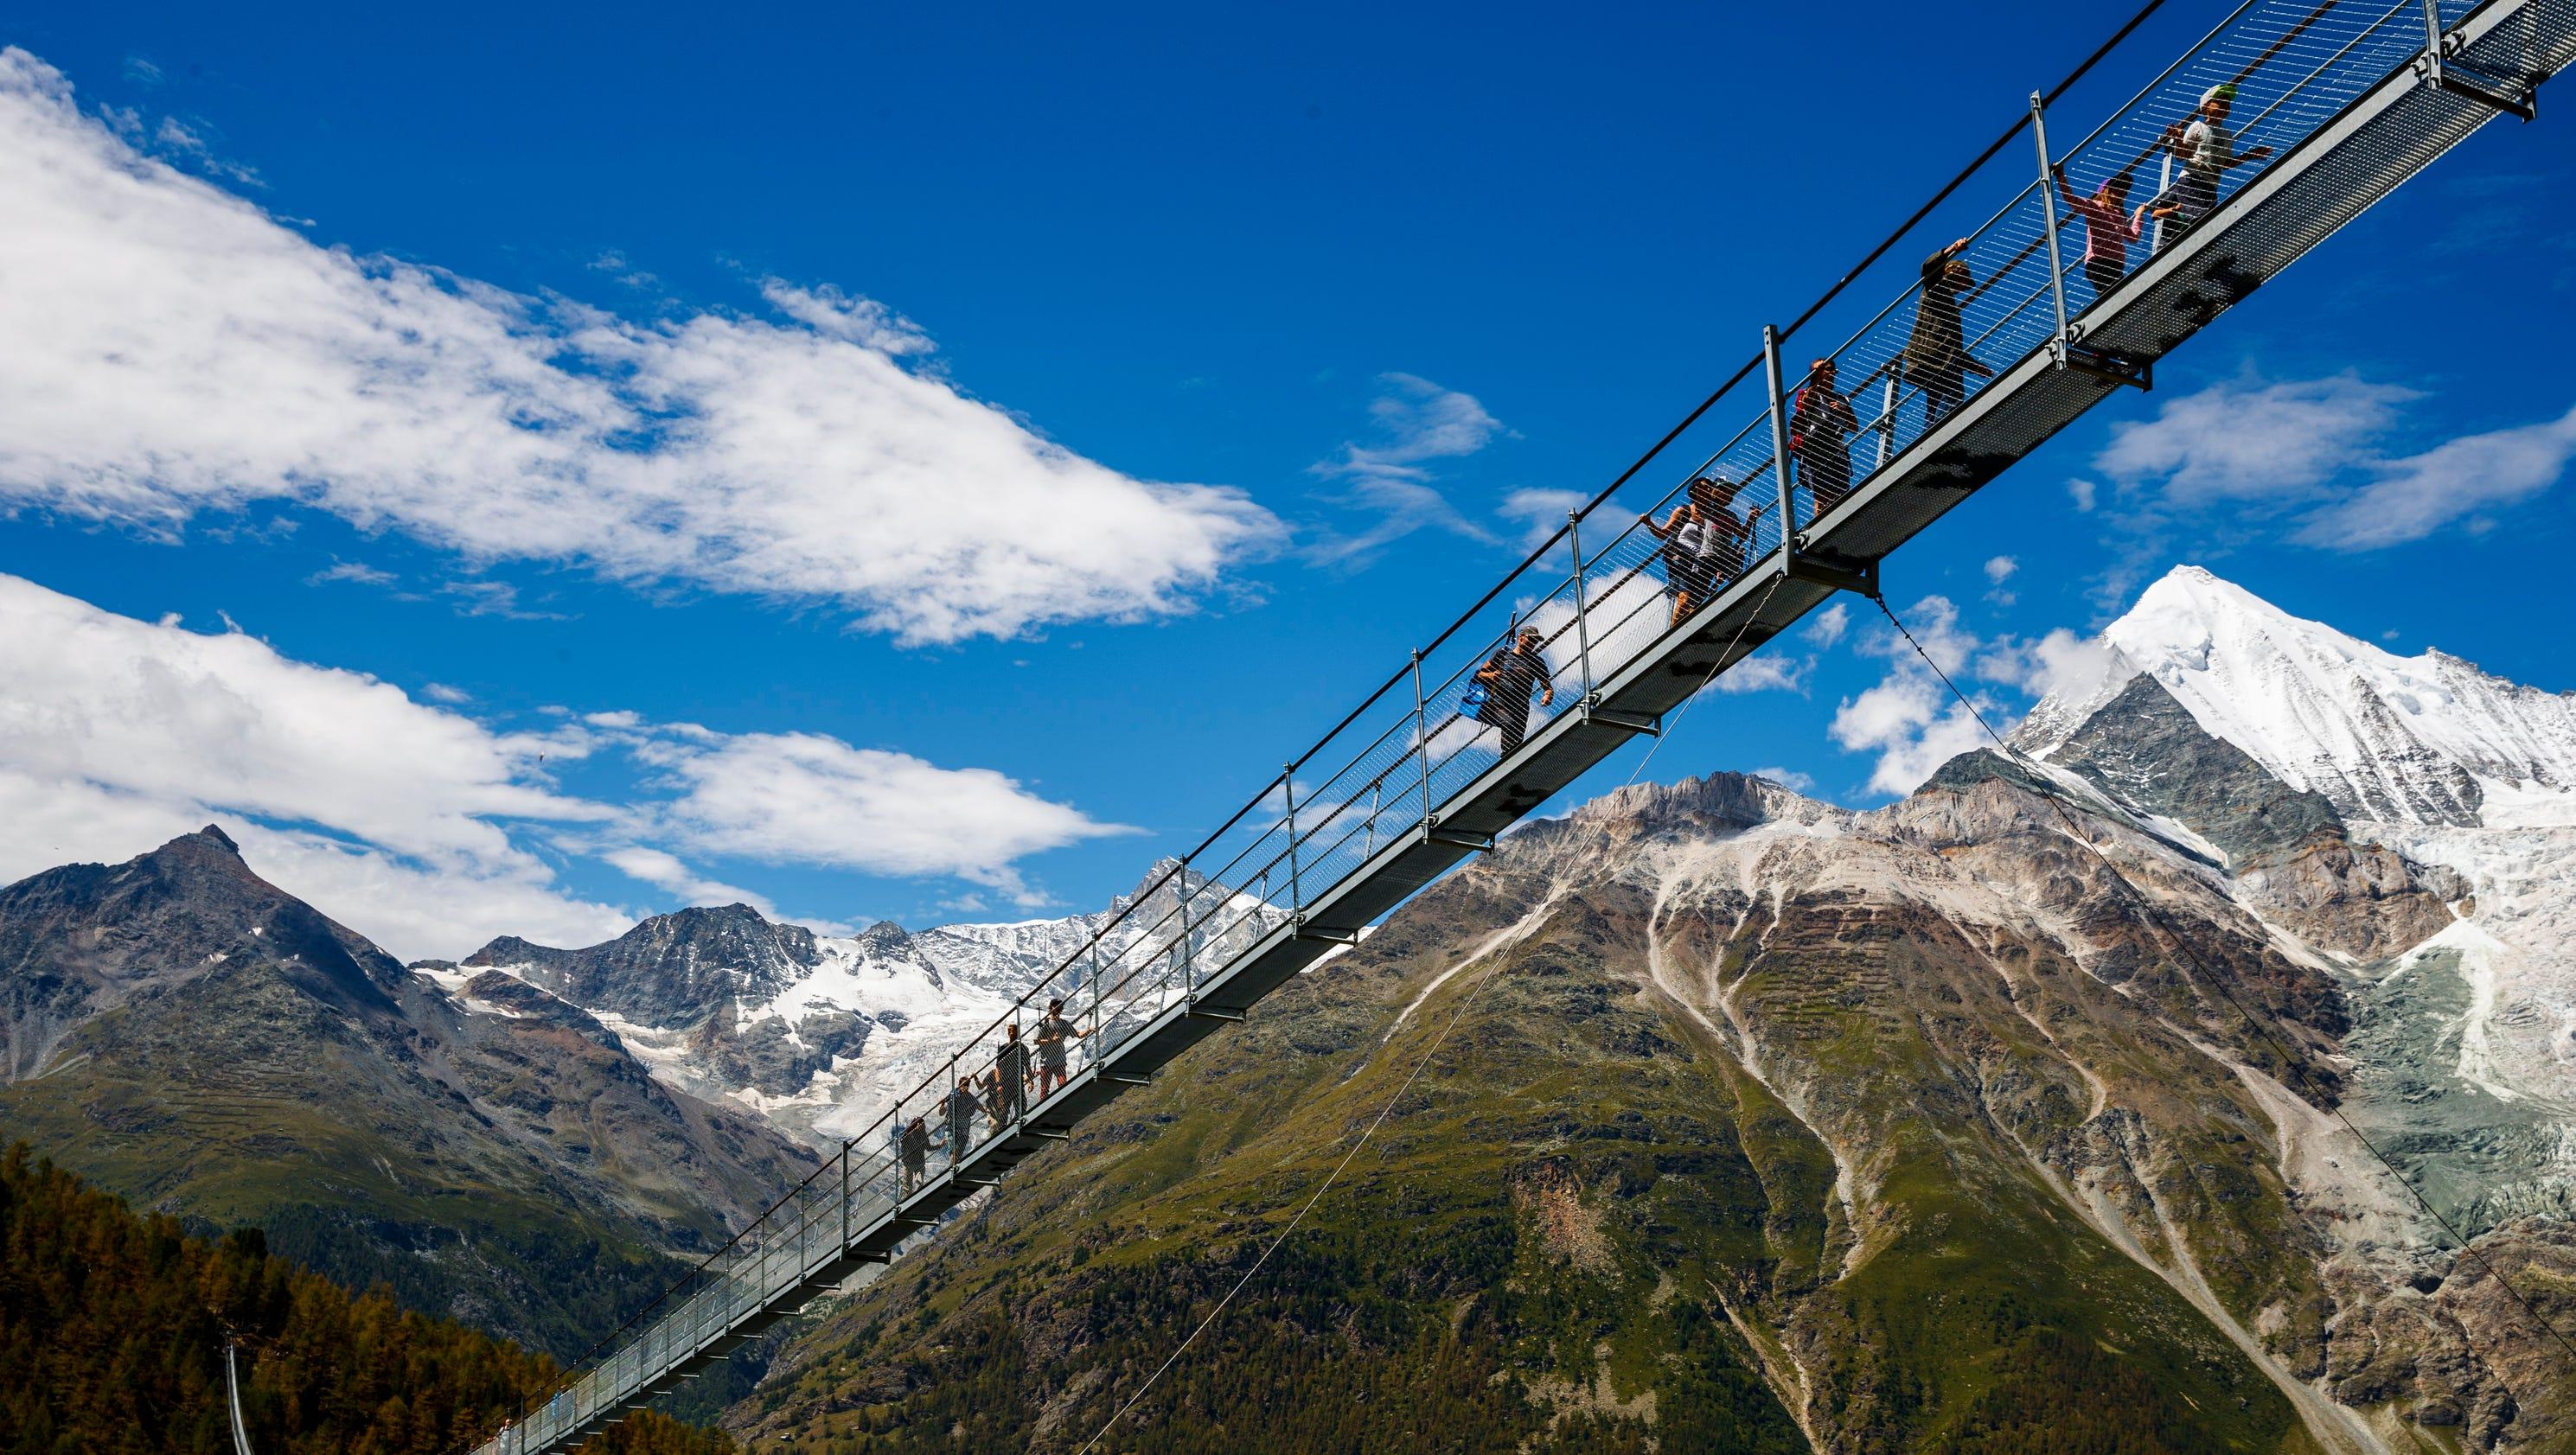 World's longest pedestrian suspension bridge opens in Switzerland